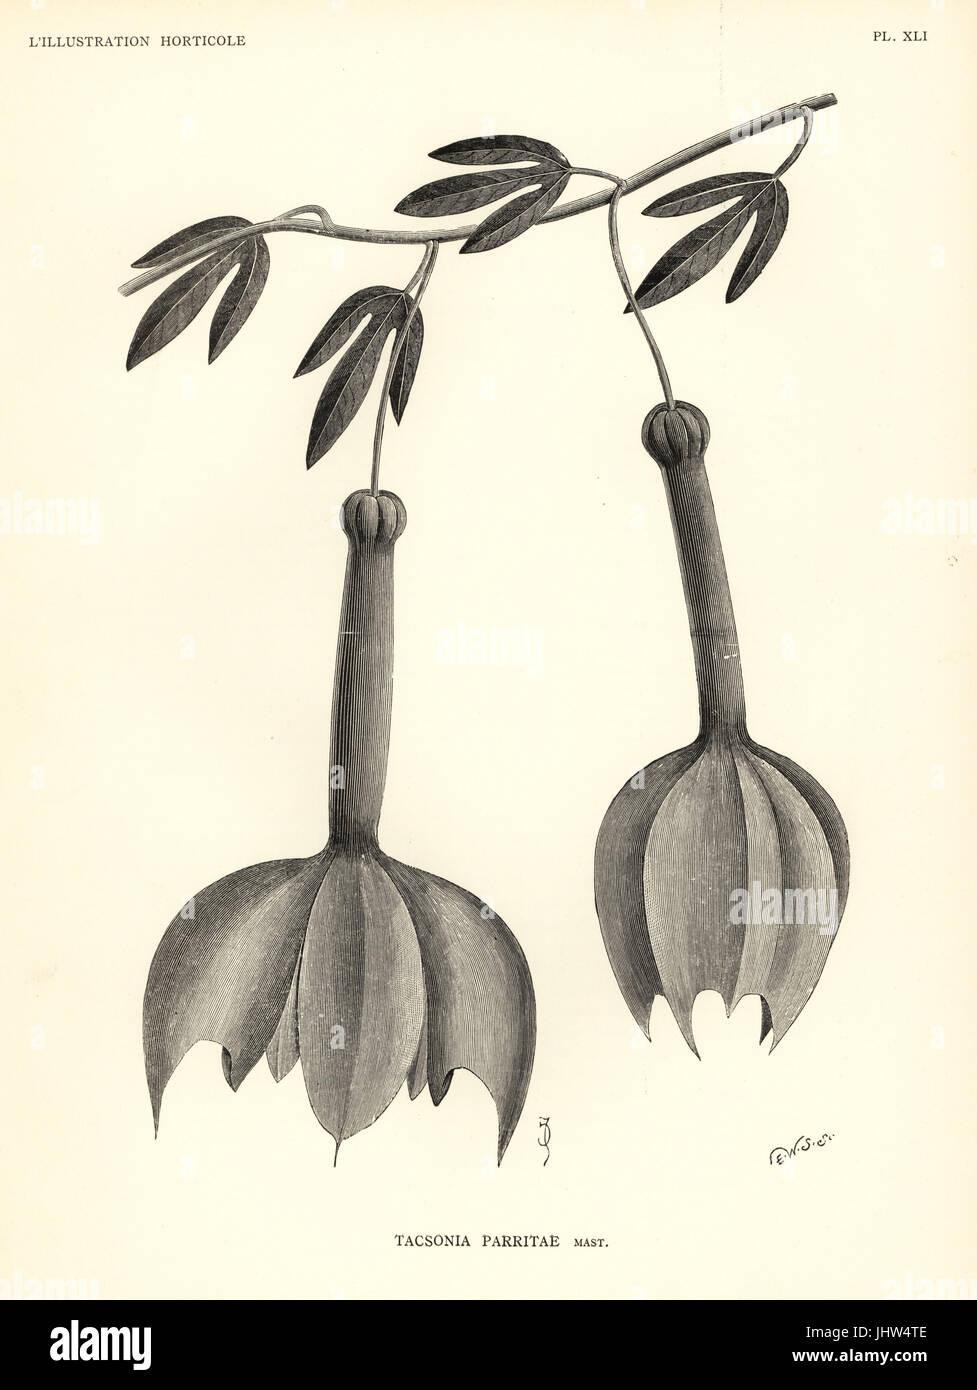 Passiflora passiflora parritae, specie gravemente minacciate (Tacsonia parritae). Xilografia incisione di E.W.S. Immagini Stock